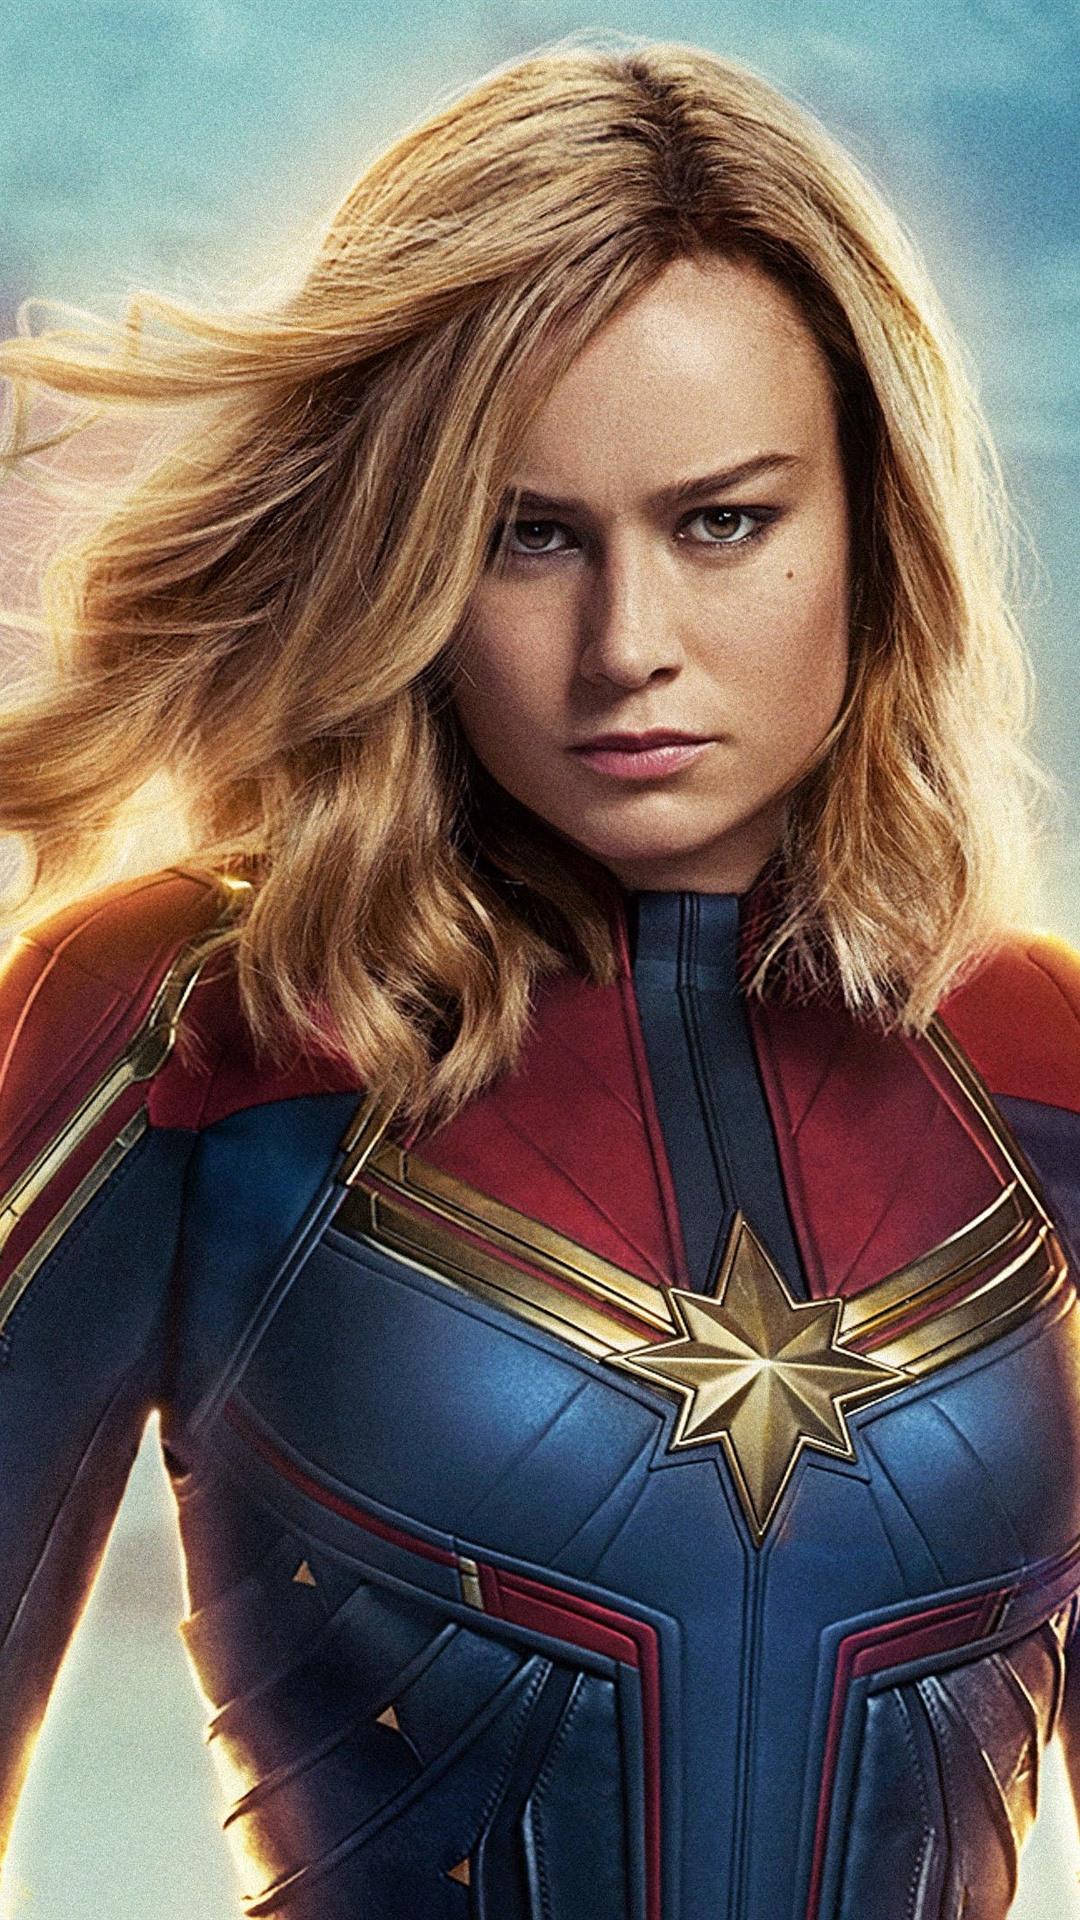 Brie Larson Captain Marvel 2019 1080x1920 iPhone 8766S Plus 1080x1920